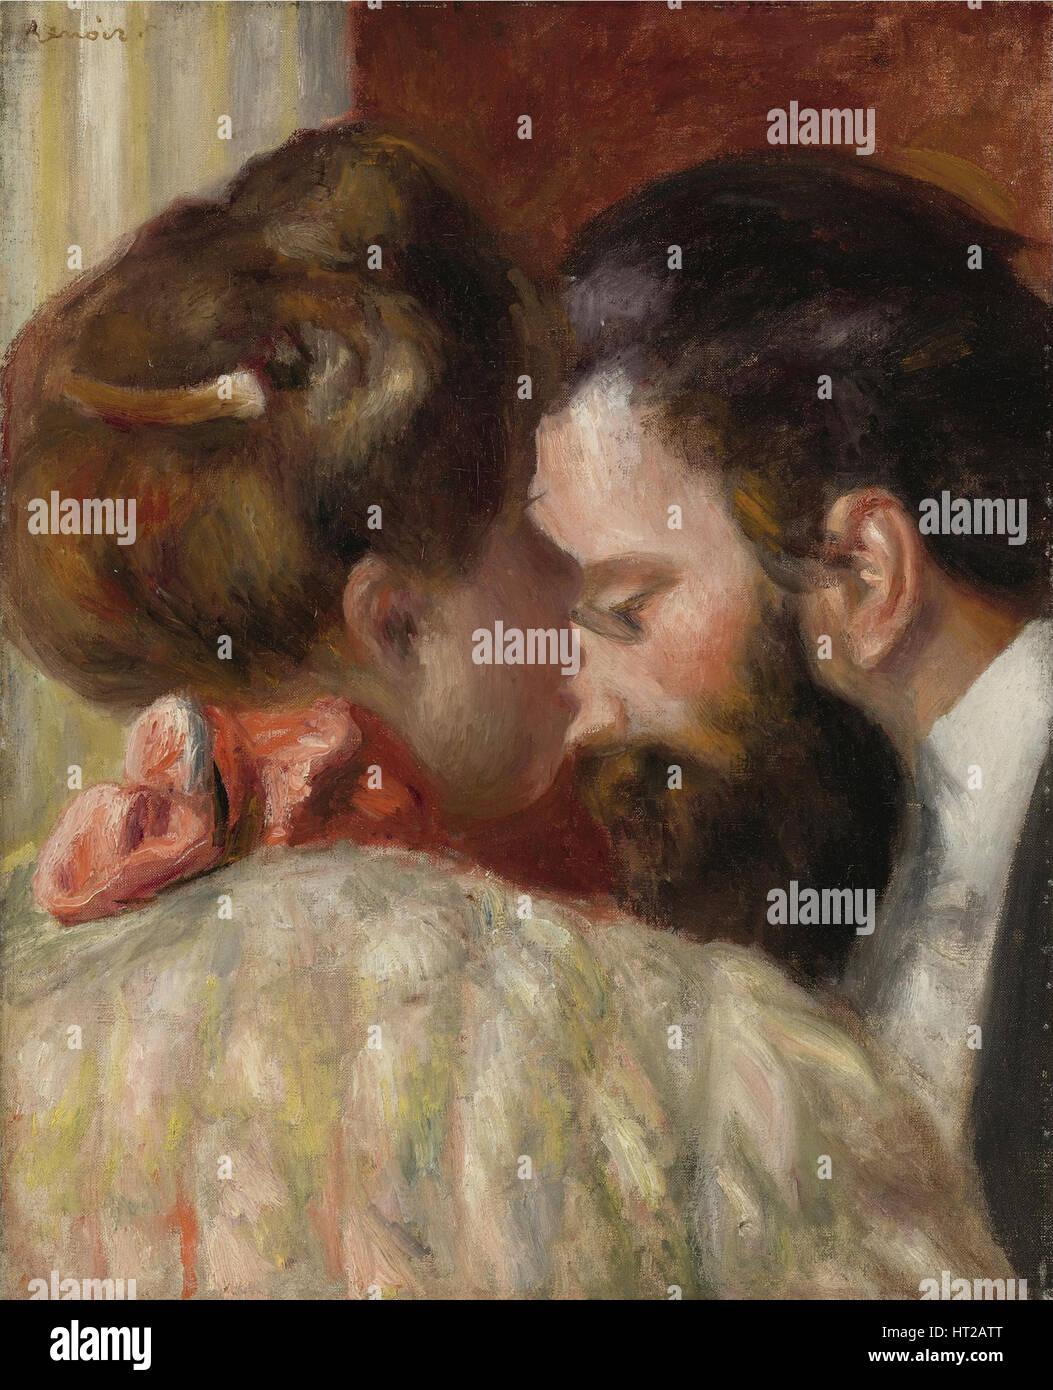 Confidence, 1897. Artist: Renoir, Pierre Auguste (1841-1919) - Stock Image